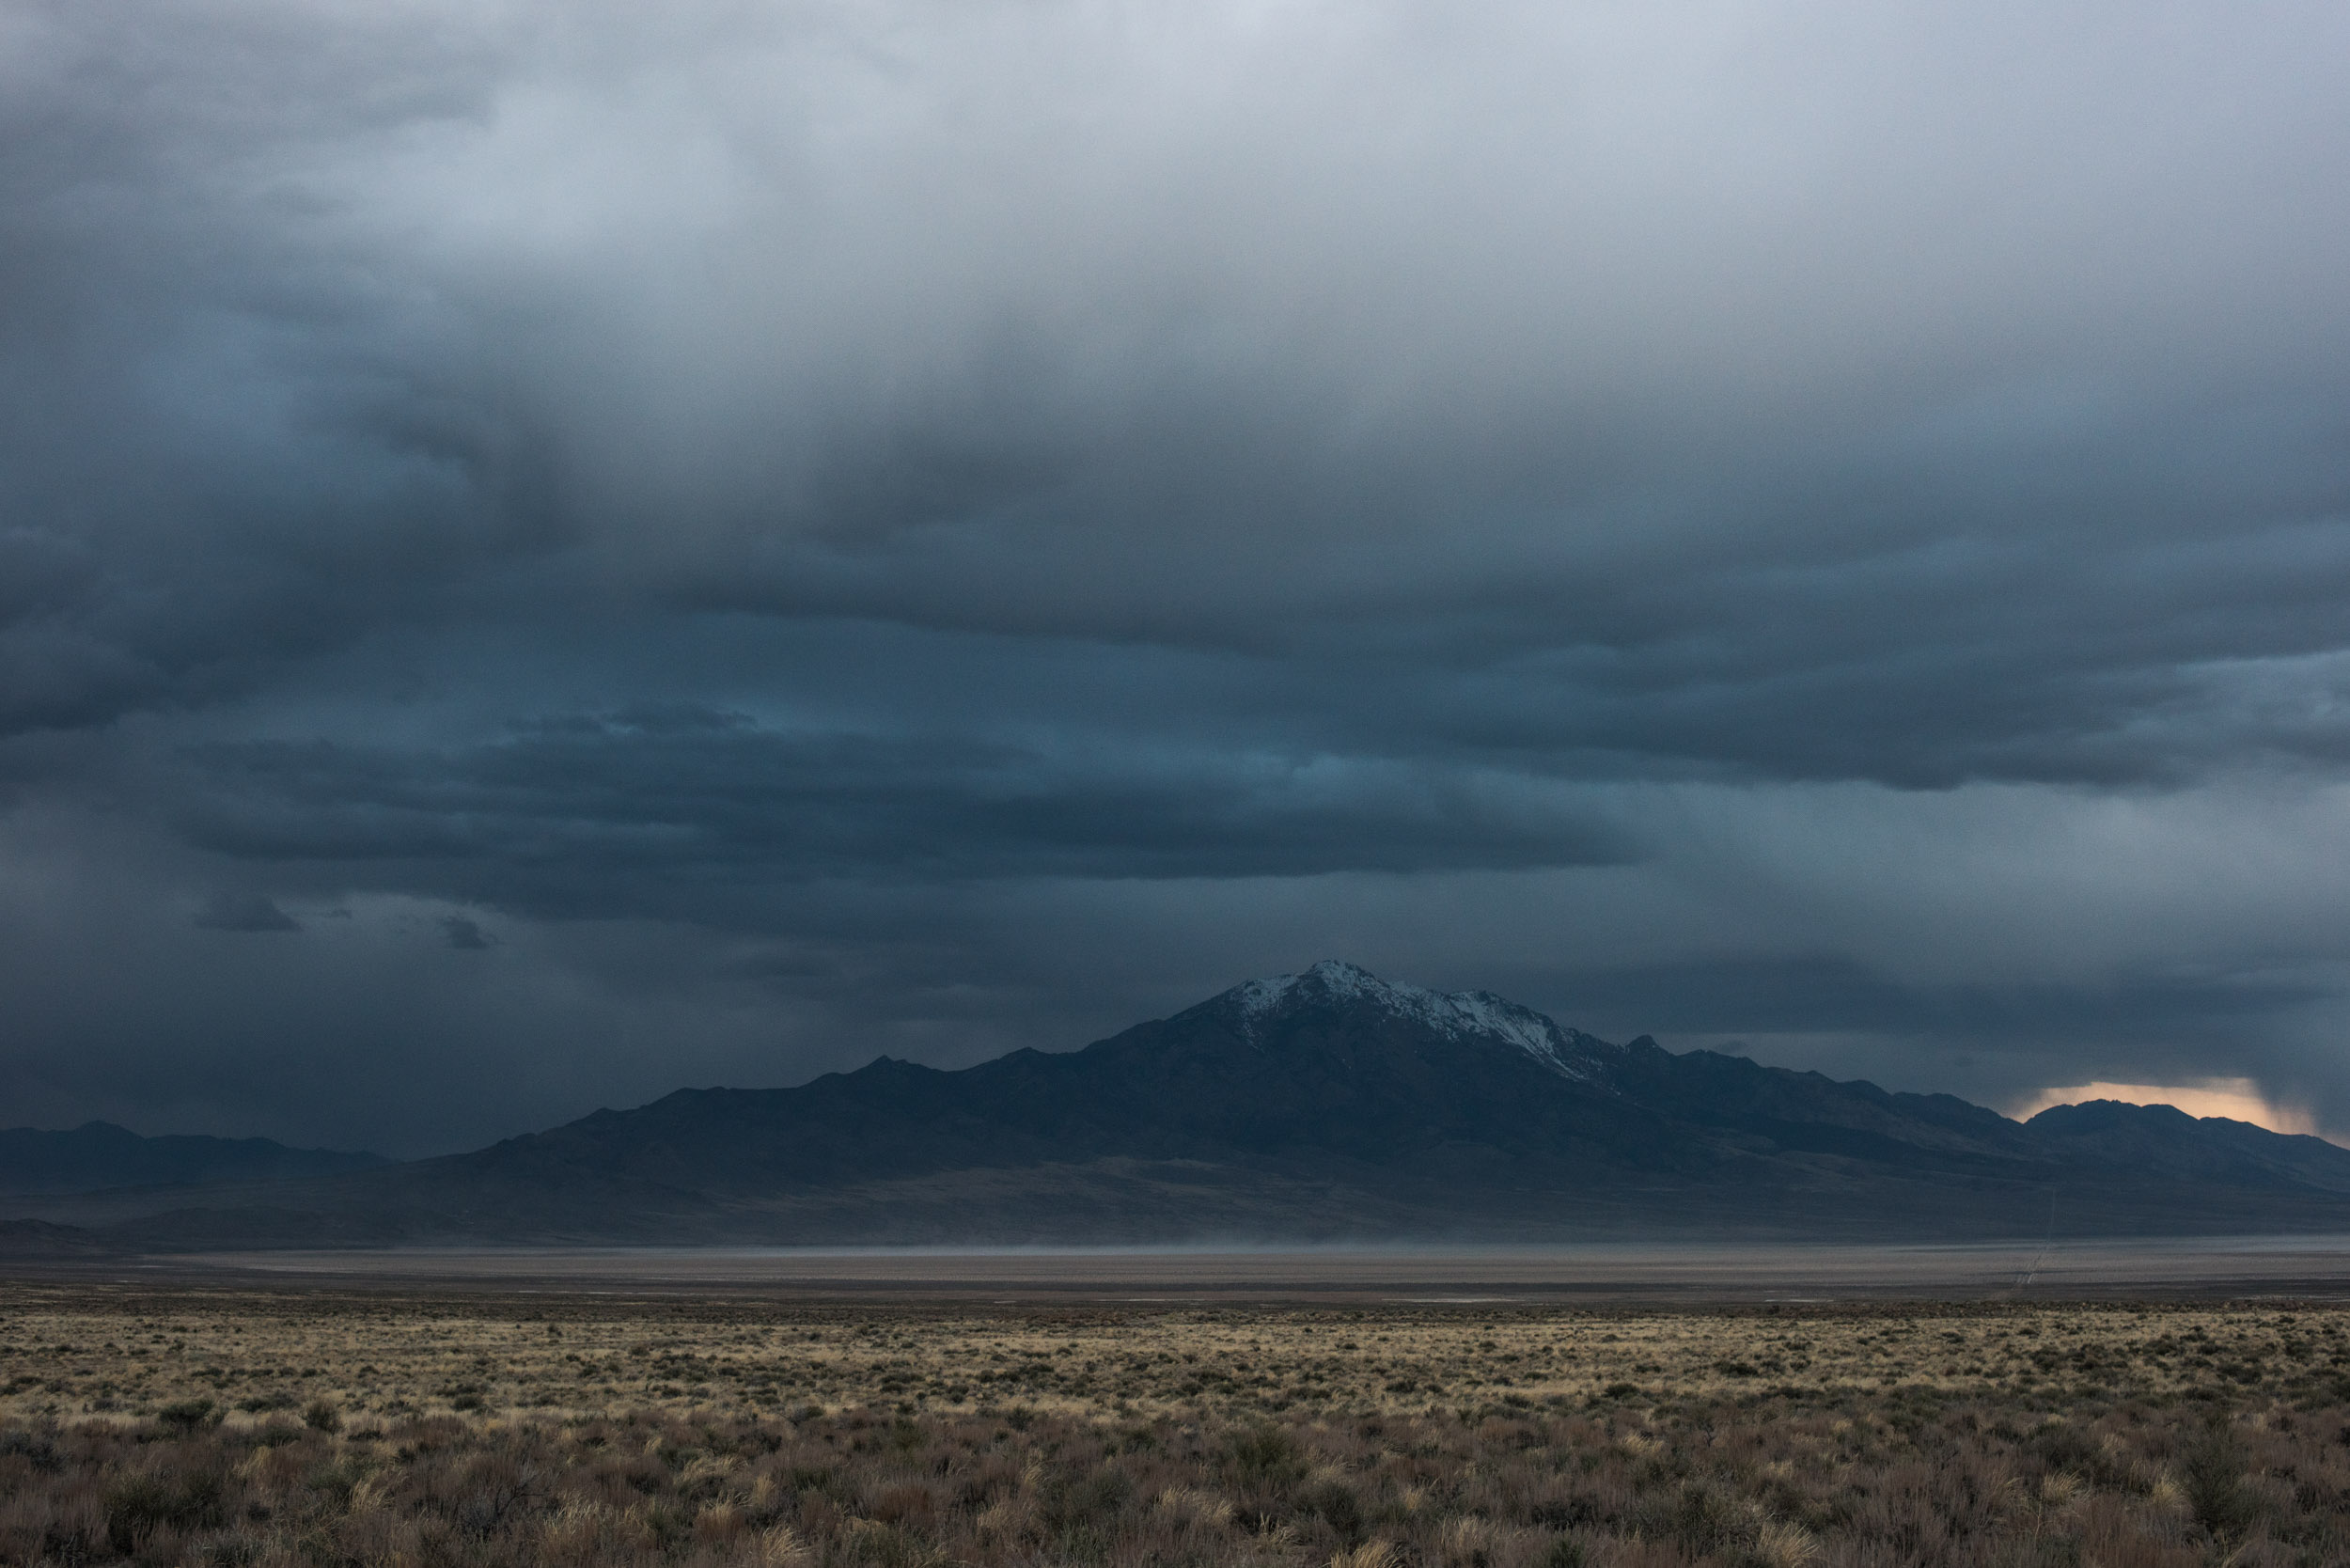 Pilot Peak, 10,719',in the Pilot Range, Nevada.